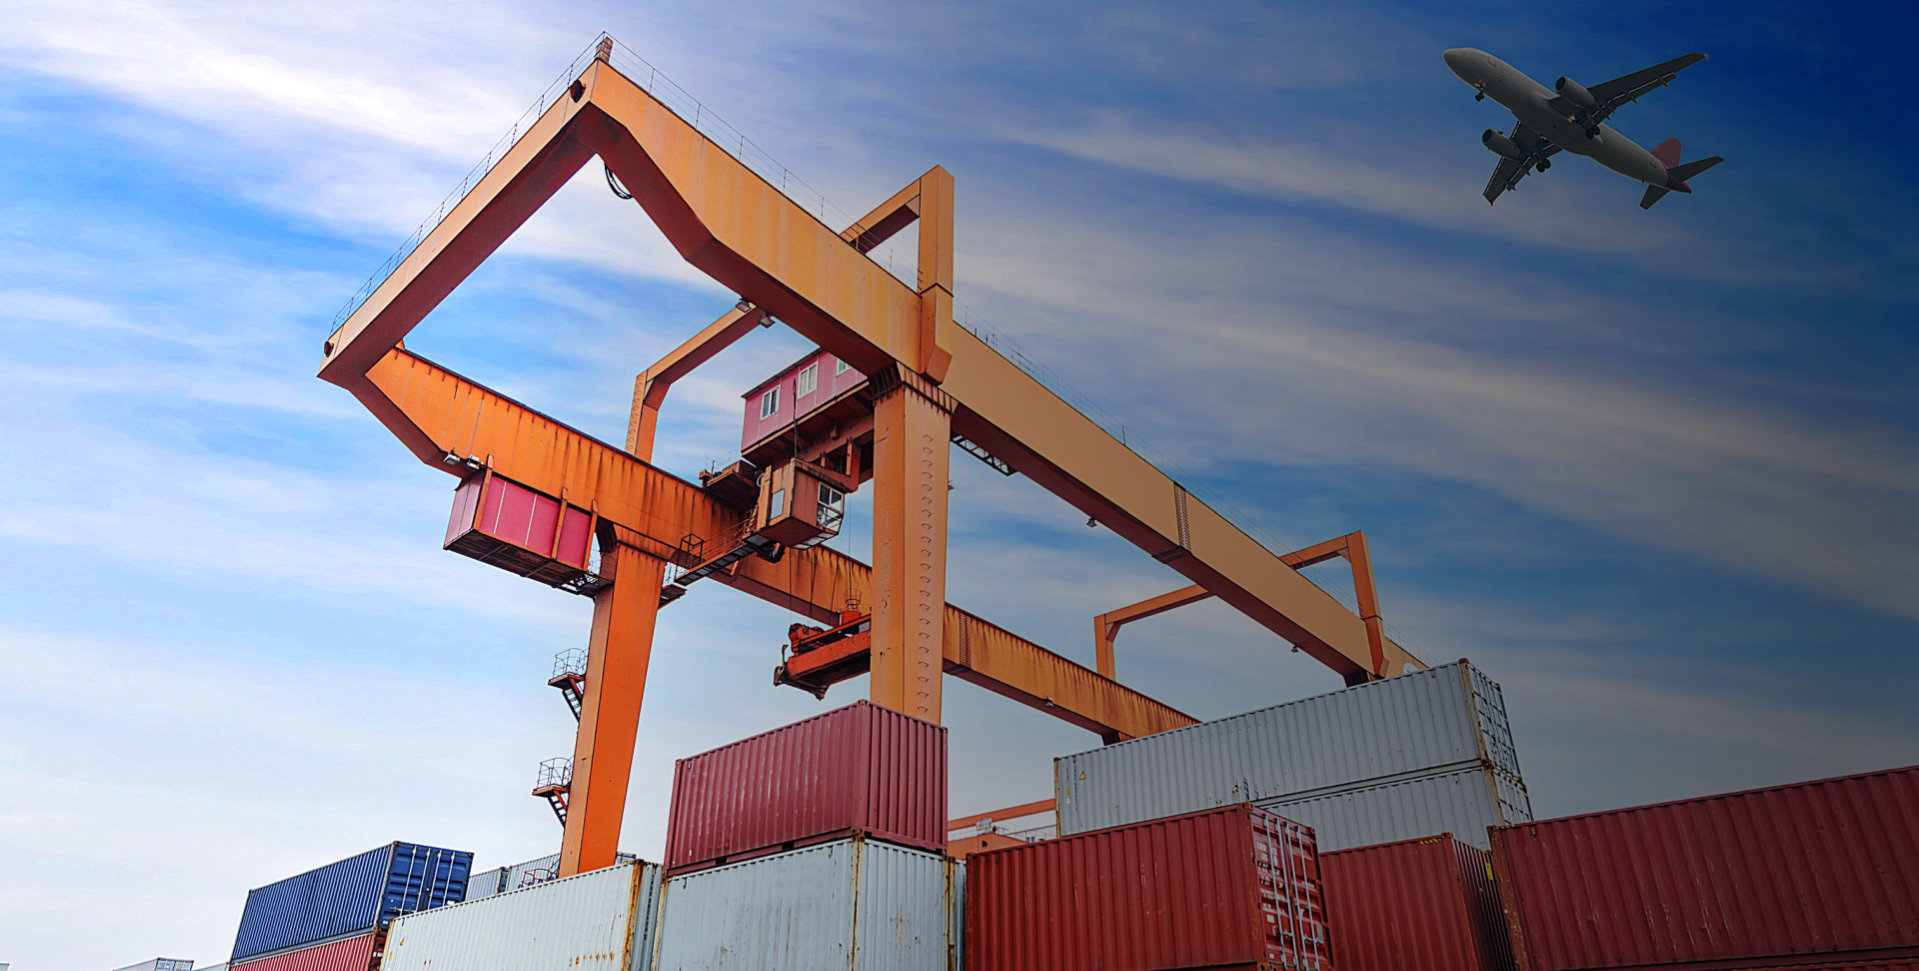 logistics concept image